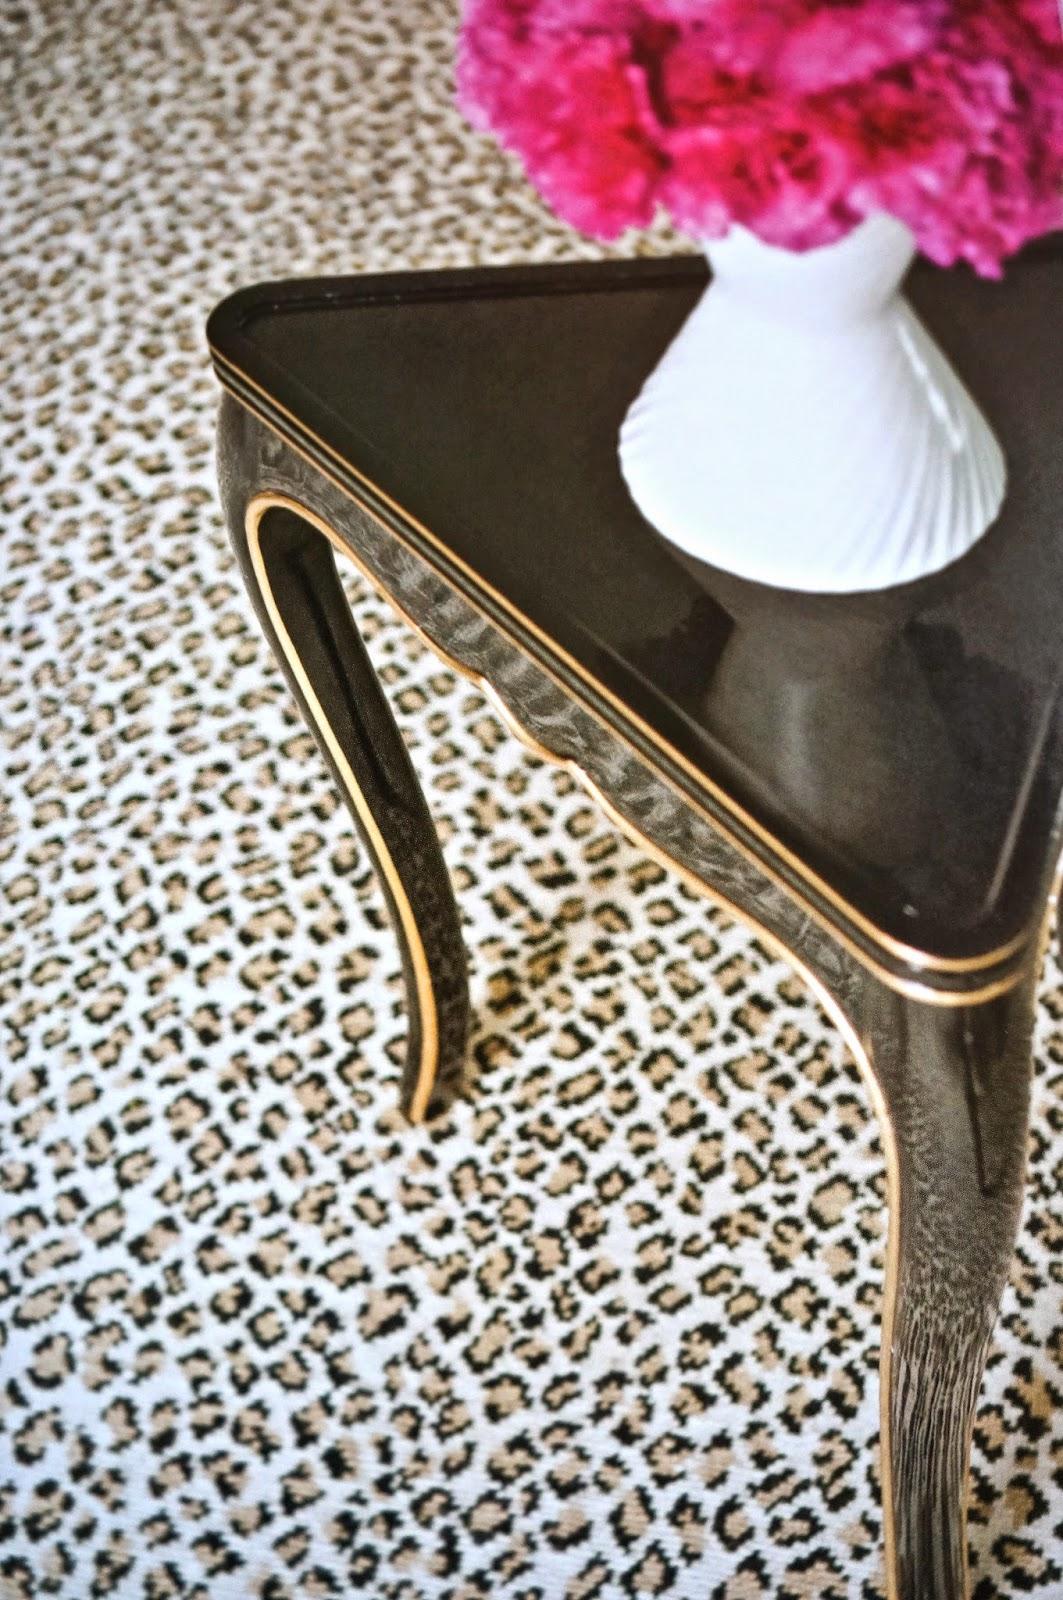 vignette design long live classic decor leopard prints. Black Bedroom Furniture Sets. Home Design Ideas